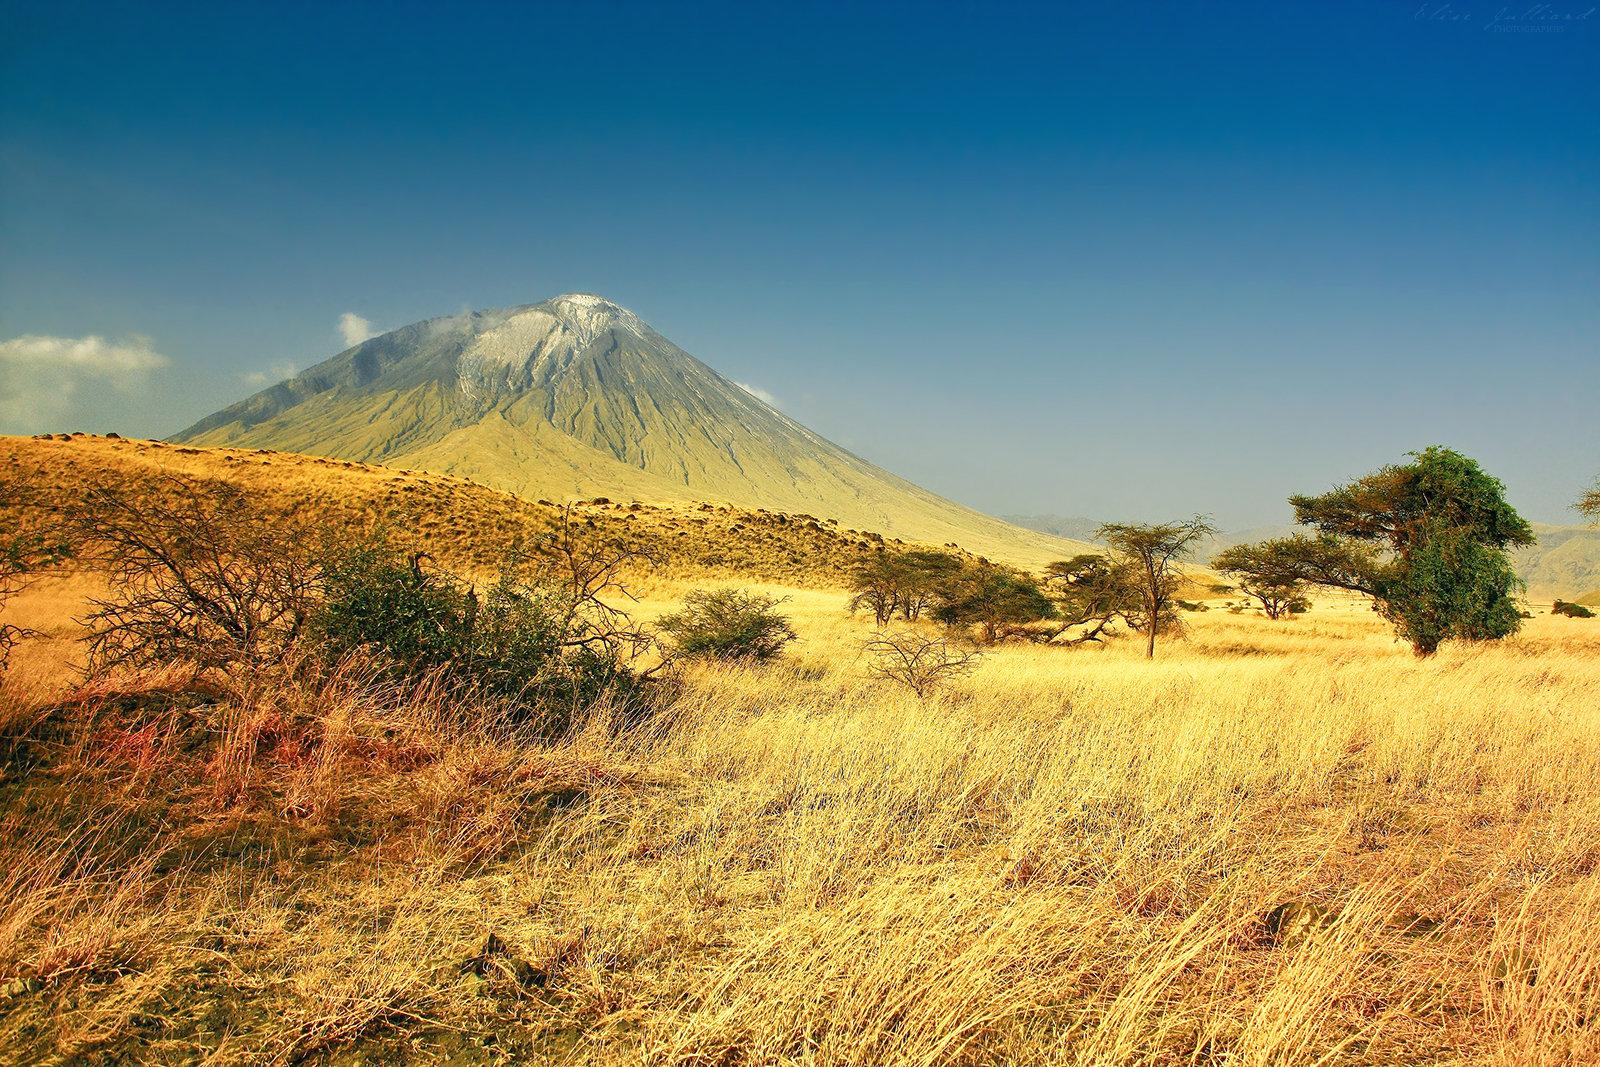 elise-julliard-photographe-photo-paysage-tanzanie-afrique-ol-doinyo-lengai-volcan-natron